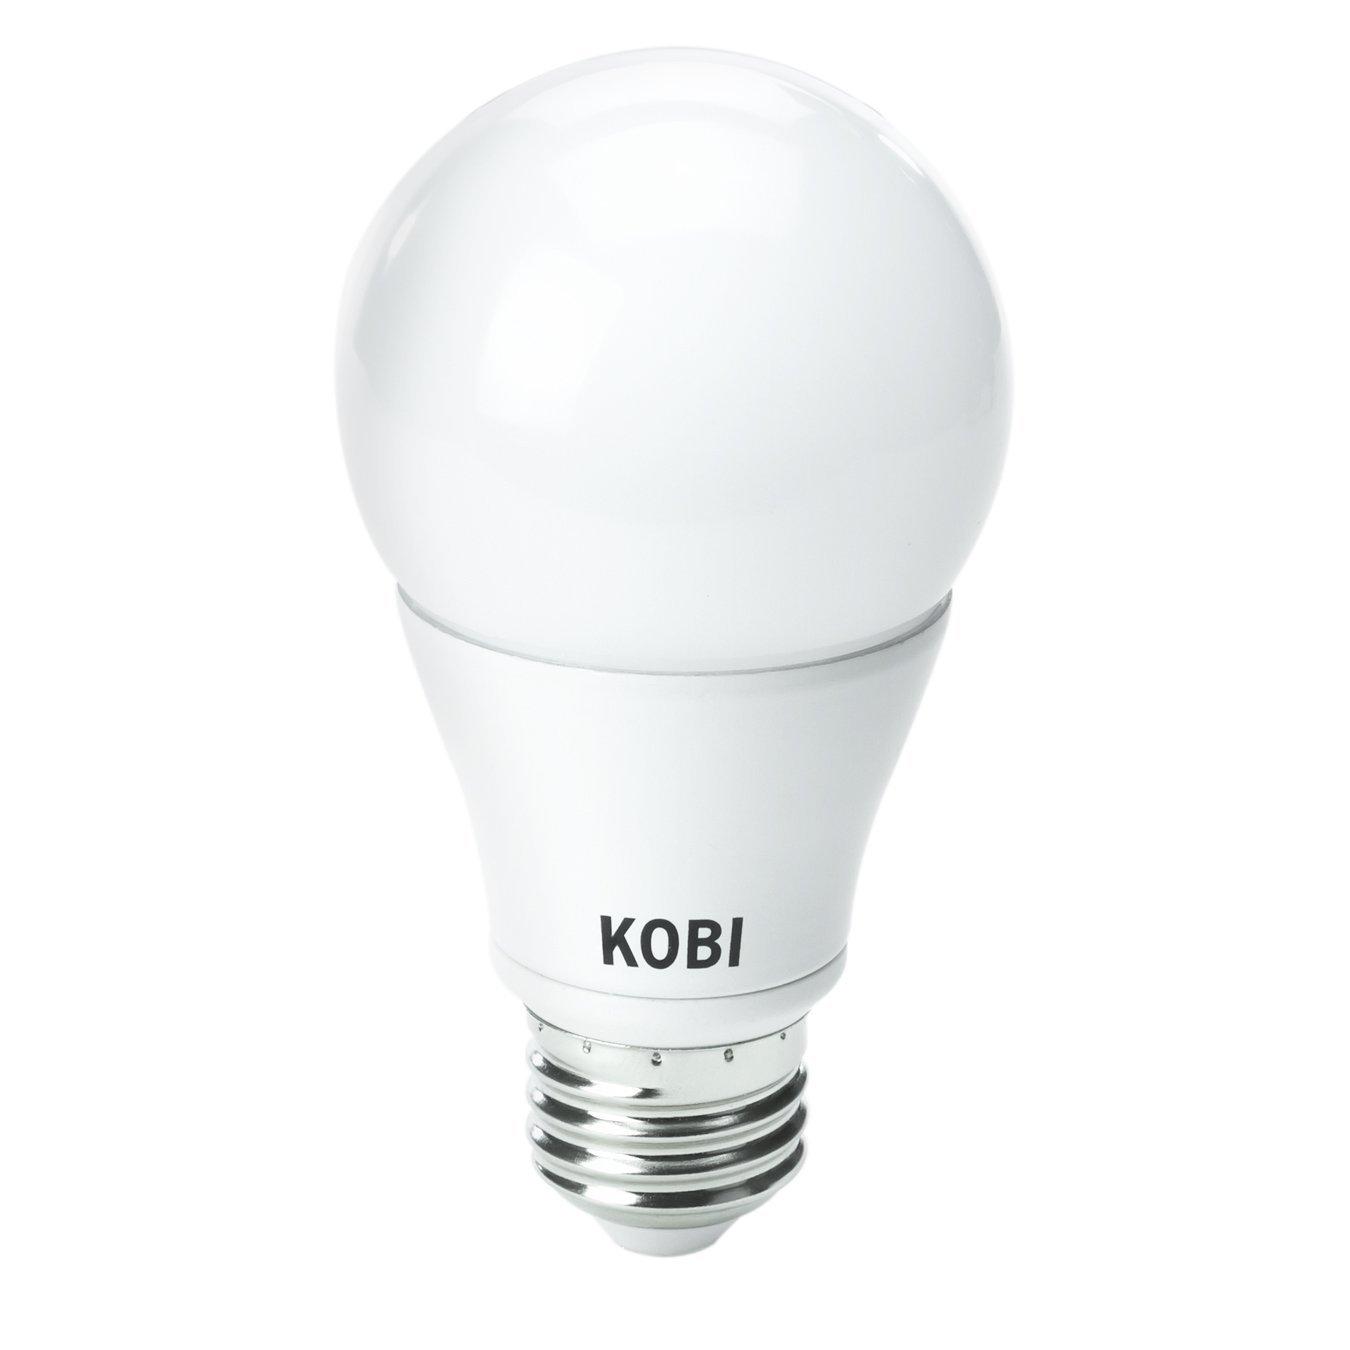 $1.79 shipped 7-watt (40-Watt) LED 4000K Neutral White Light Bulb, Dimmable w/ Prime @ Amazon